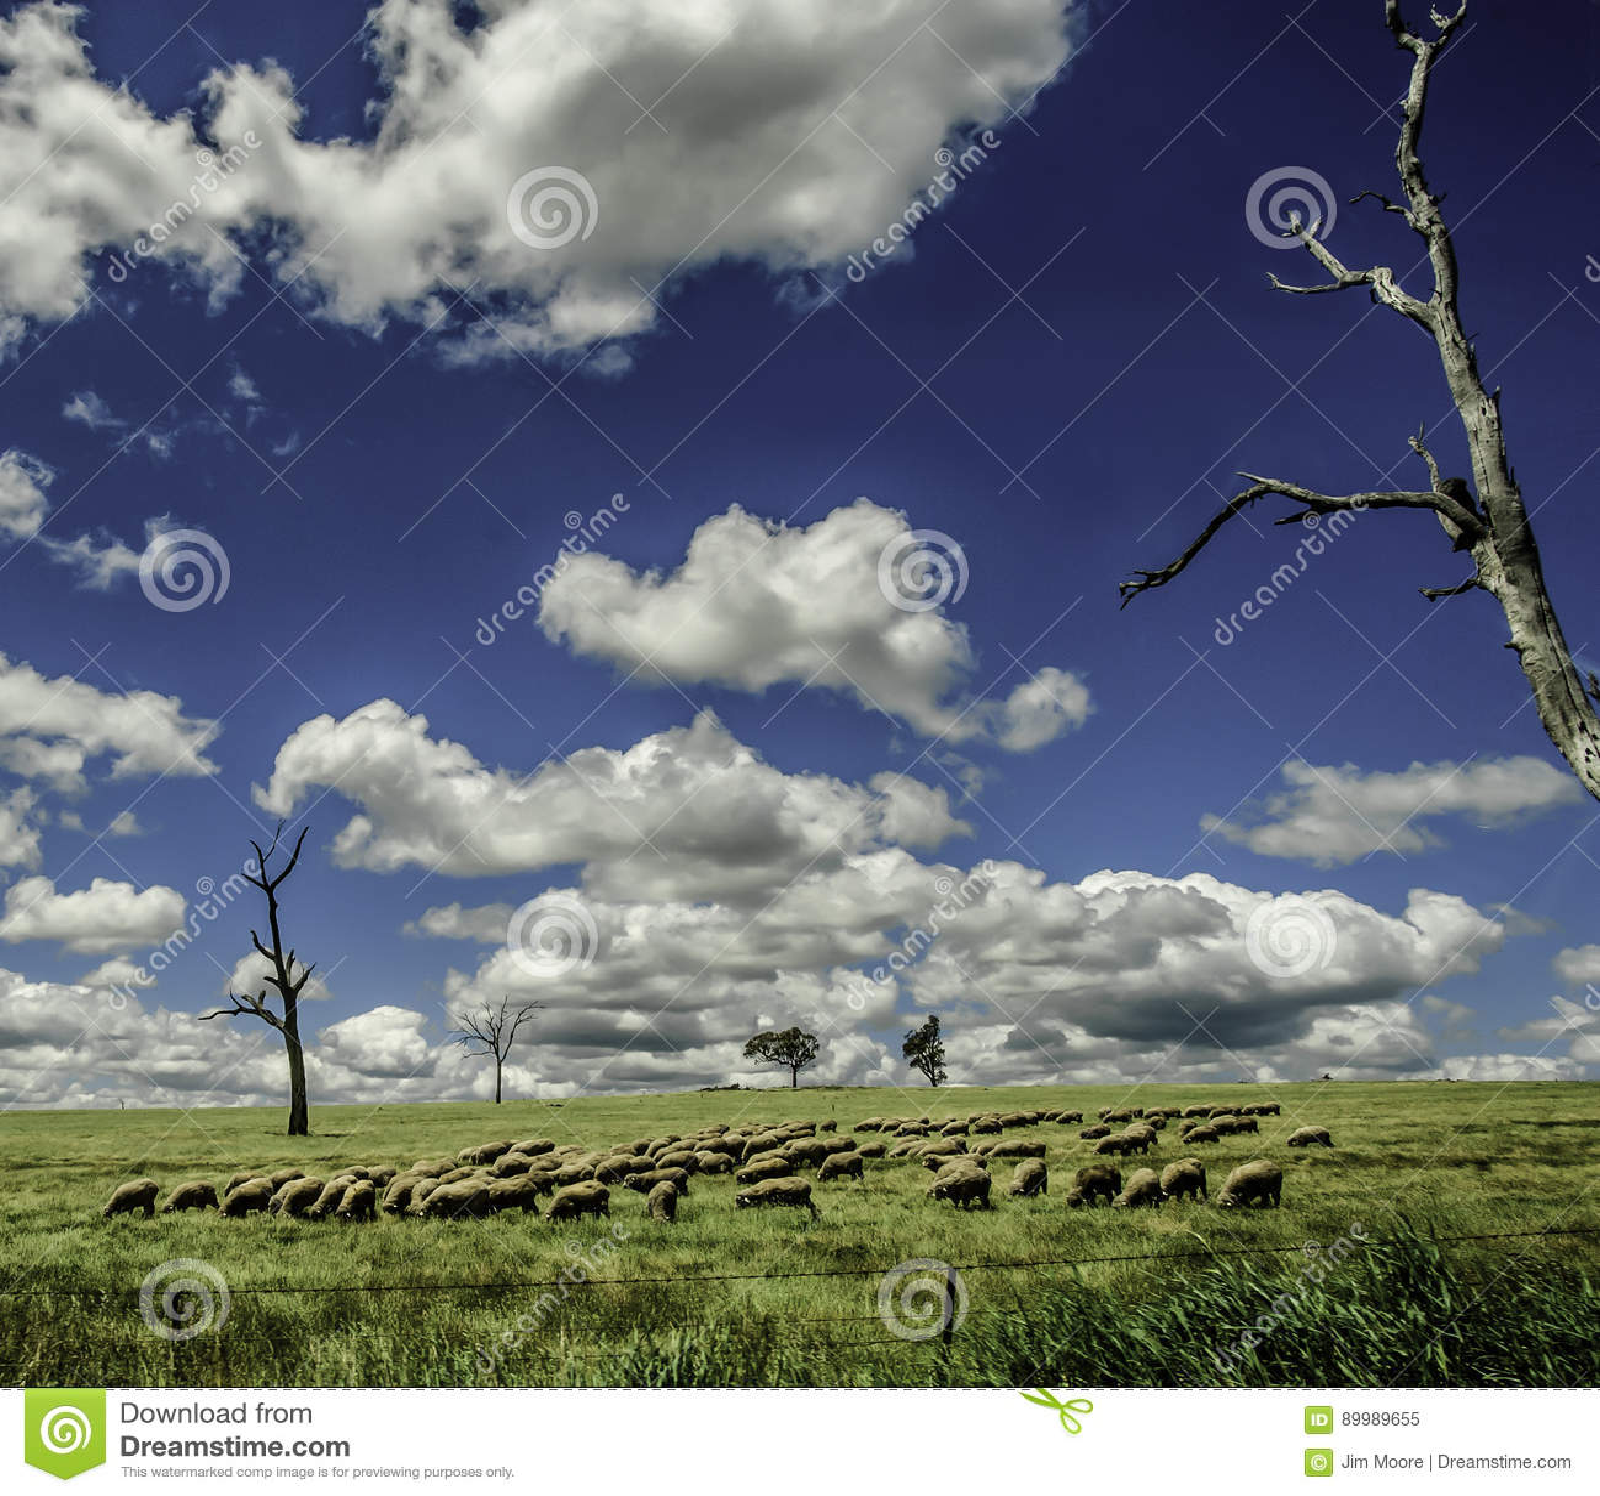 Schafe Graze Under Blue Skies in New South Wales Australien